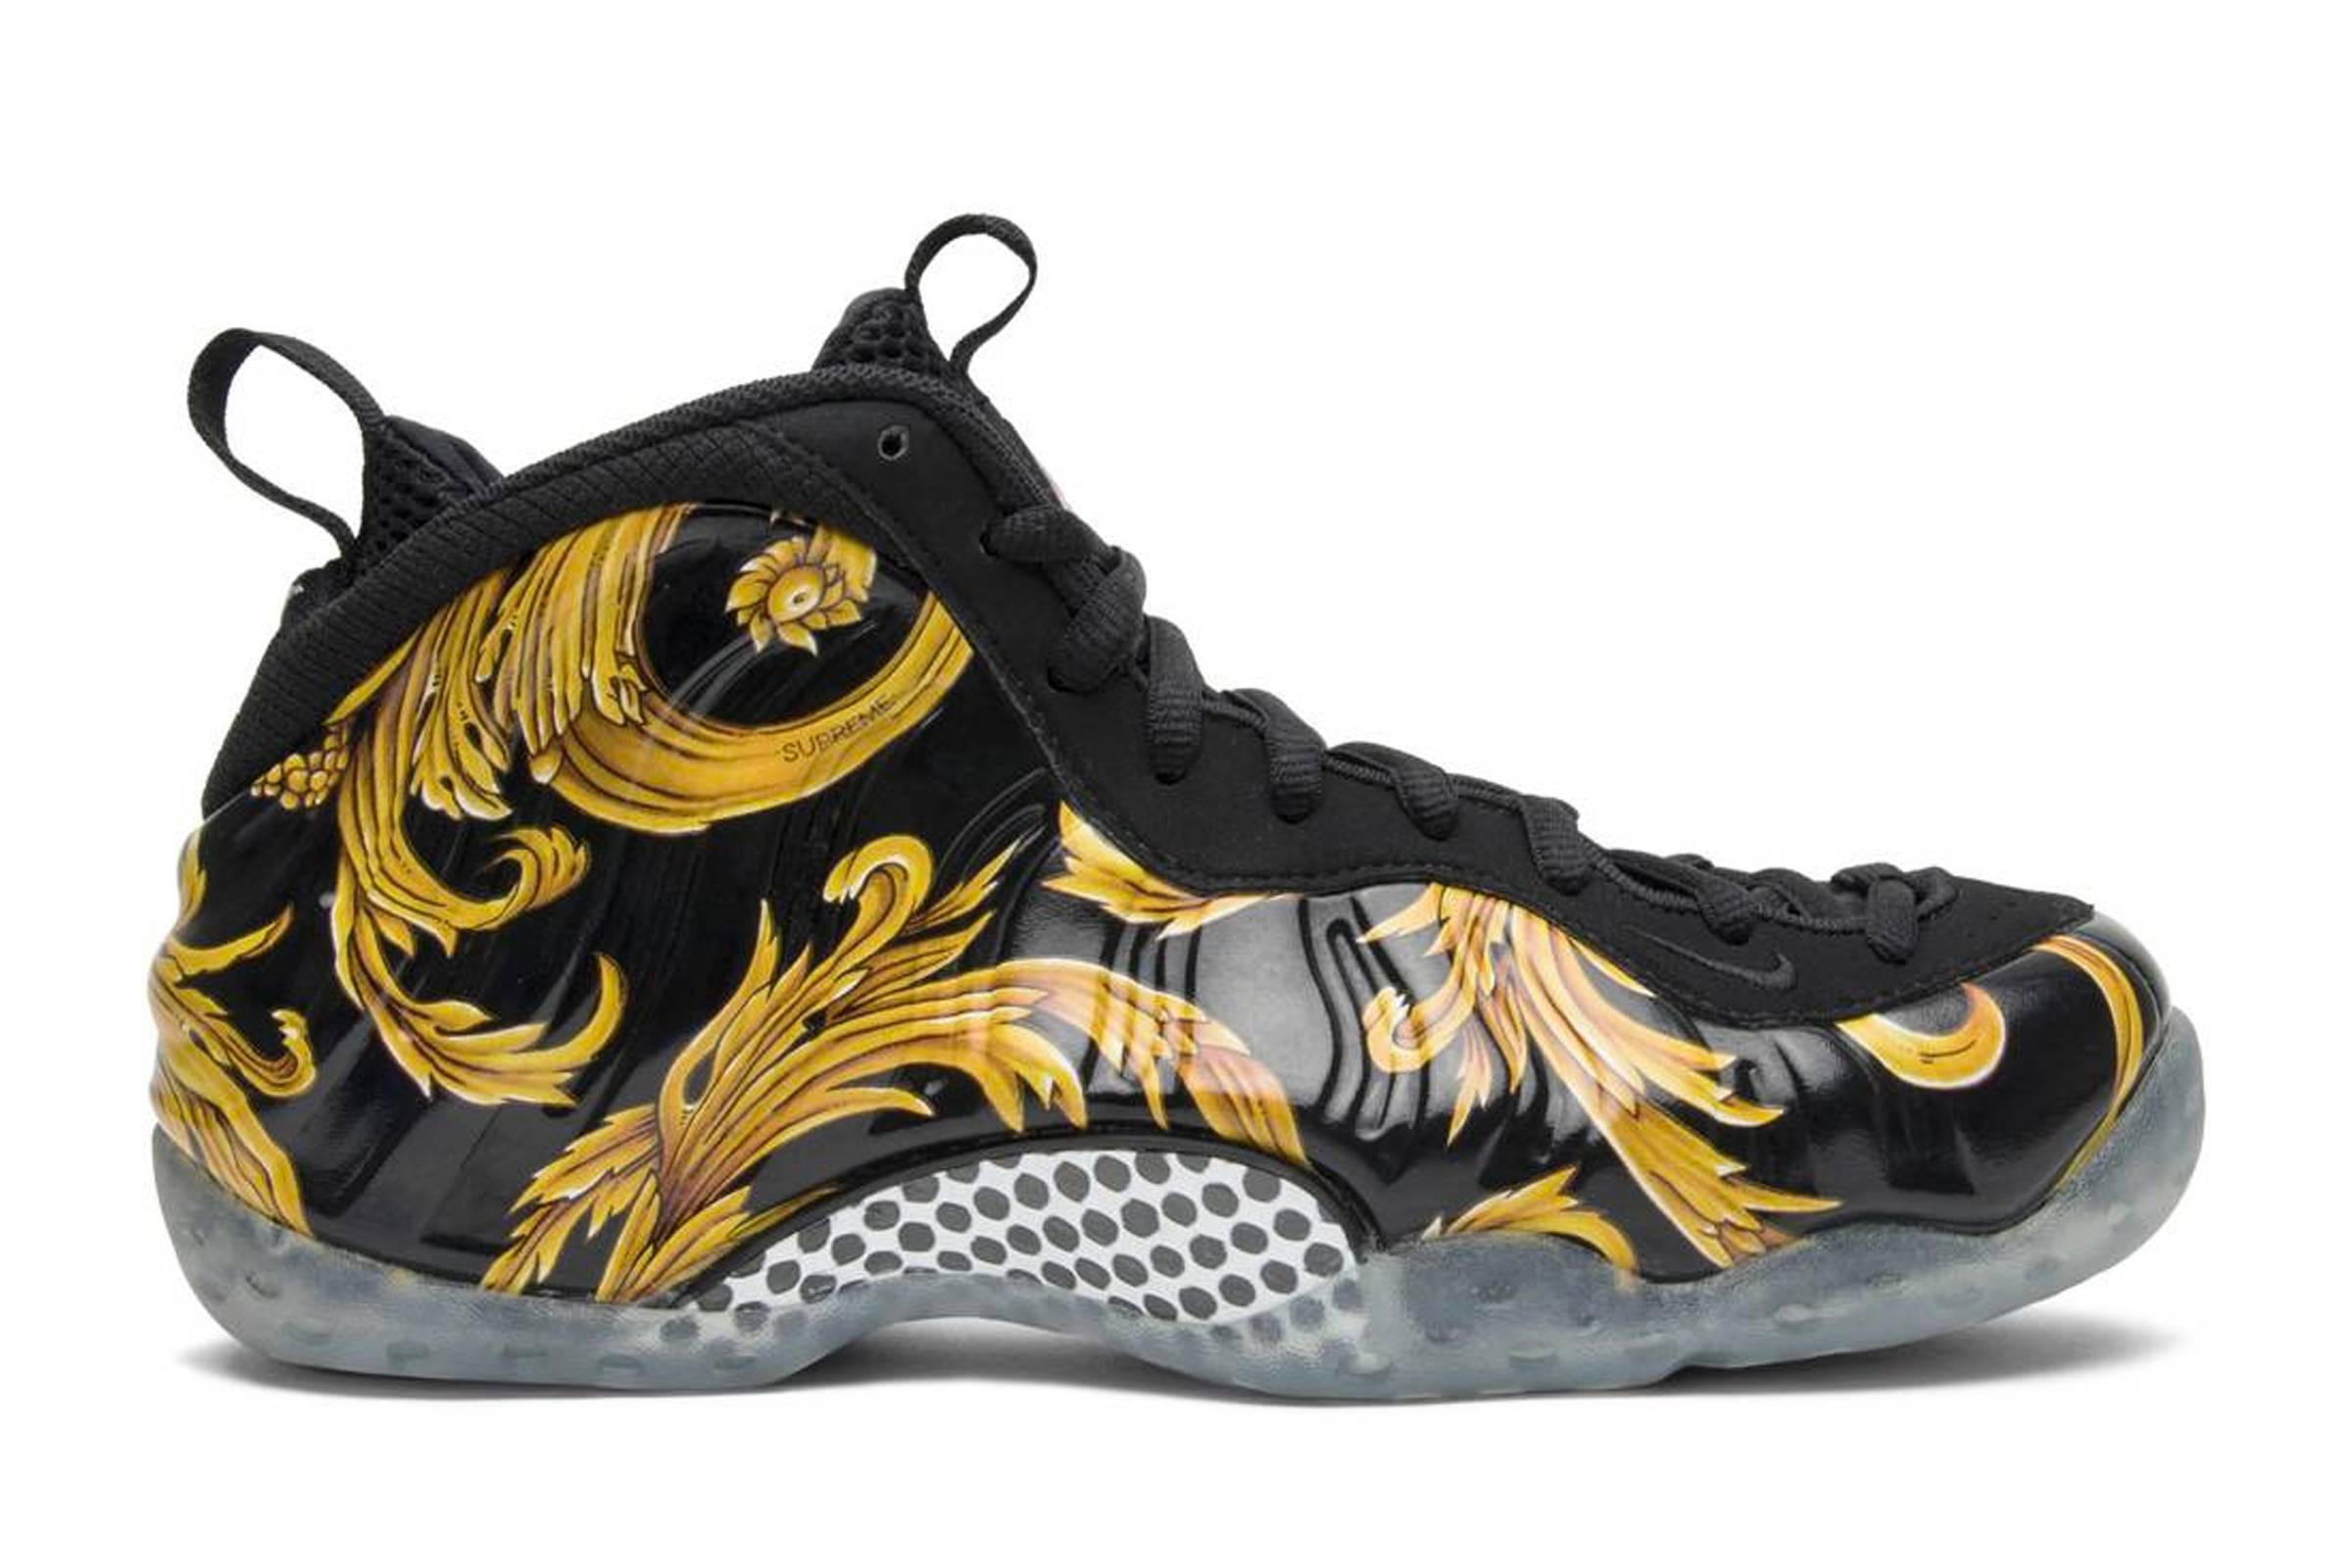 Supreme x Nike Foamposite One